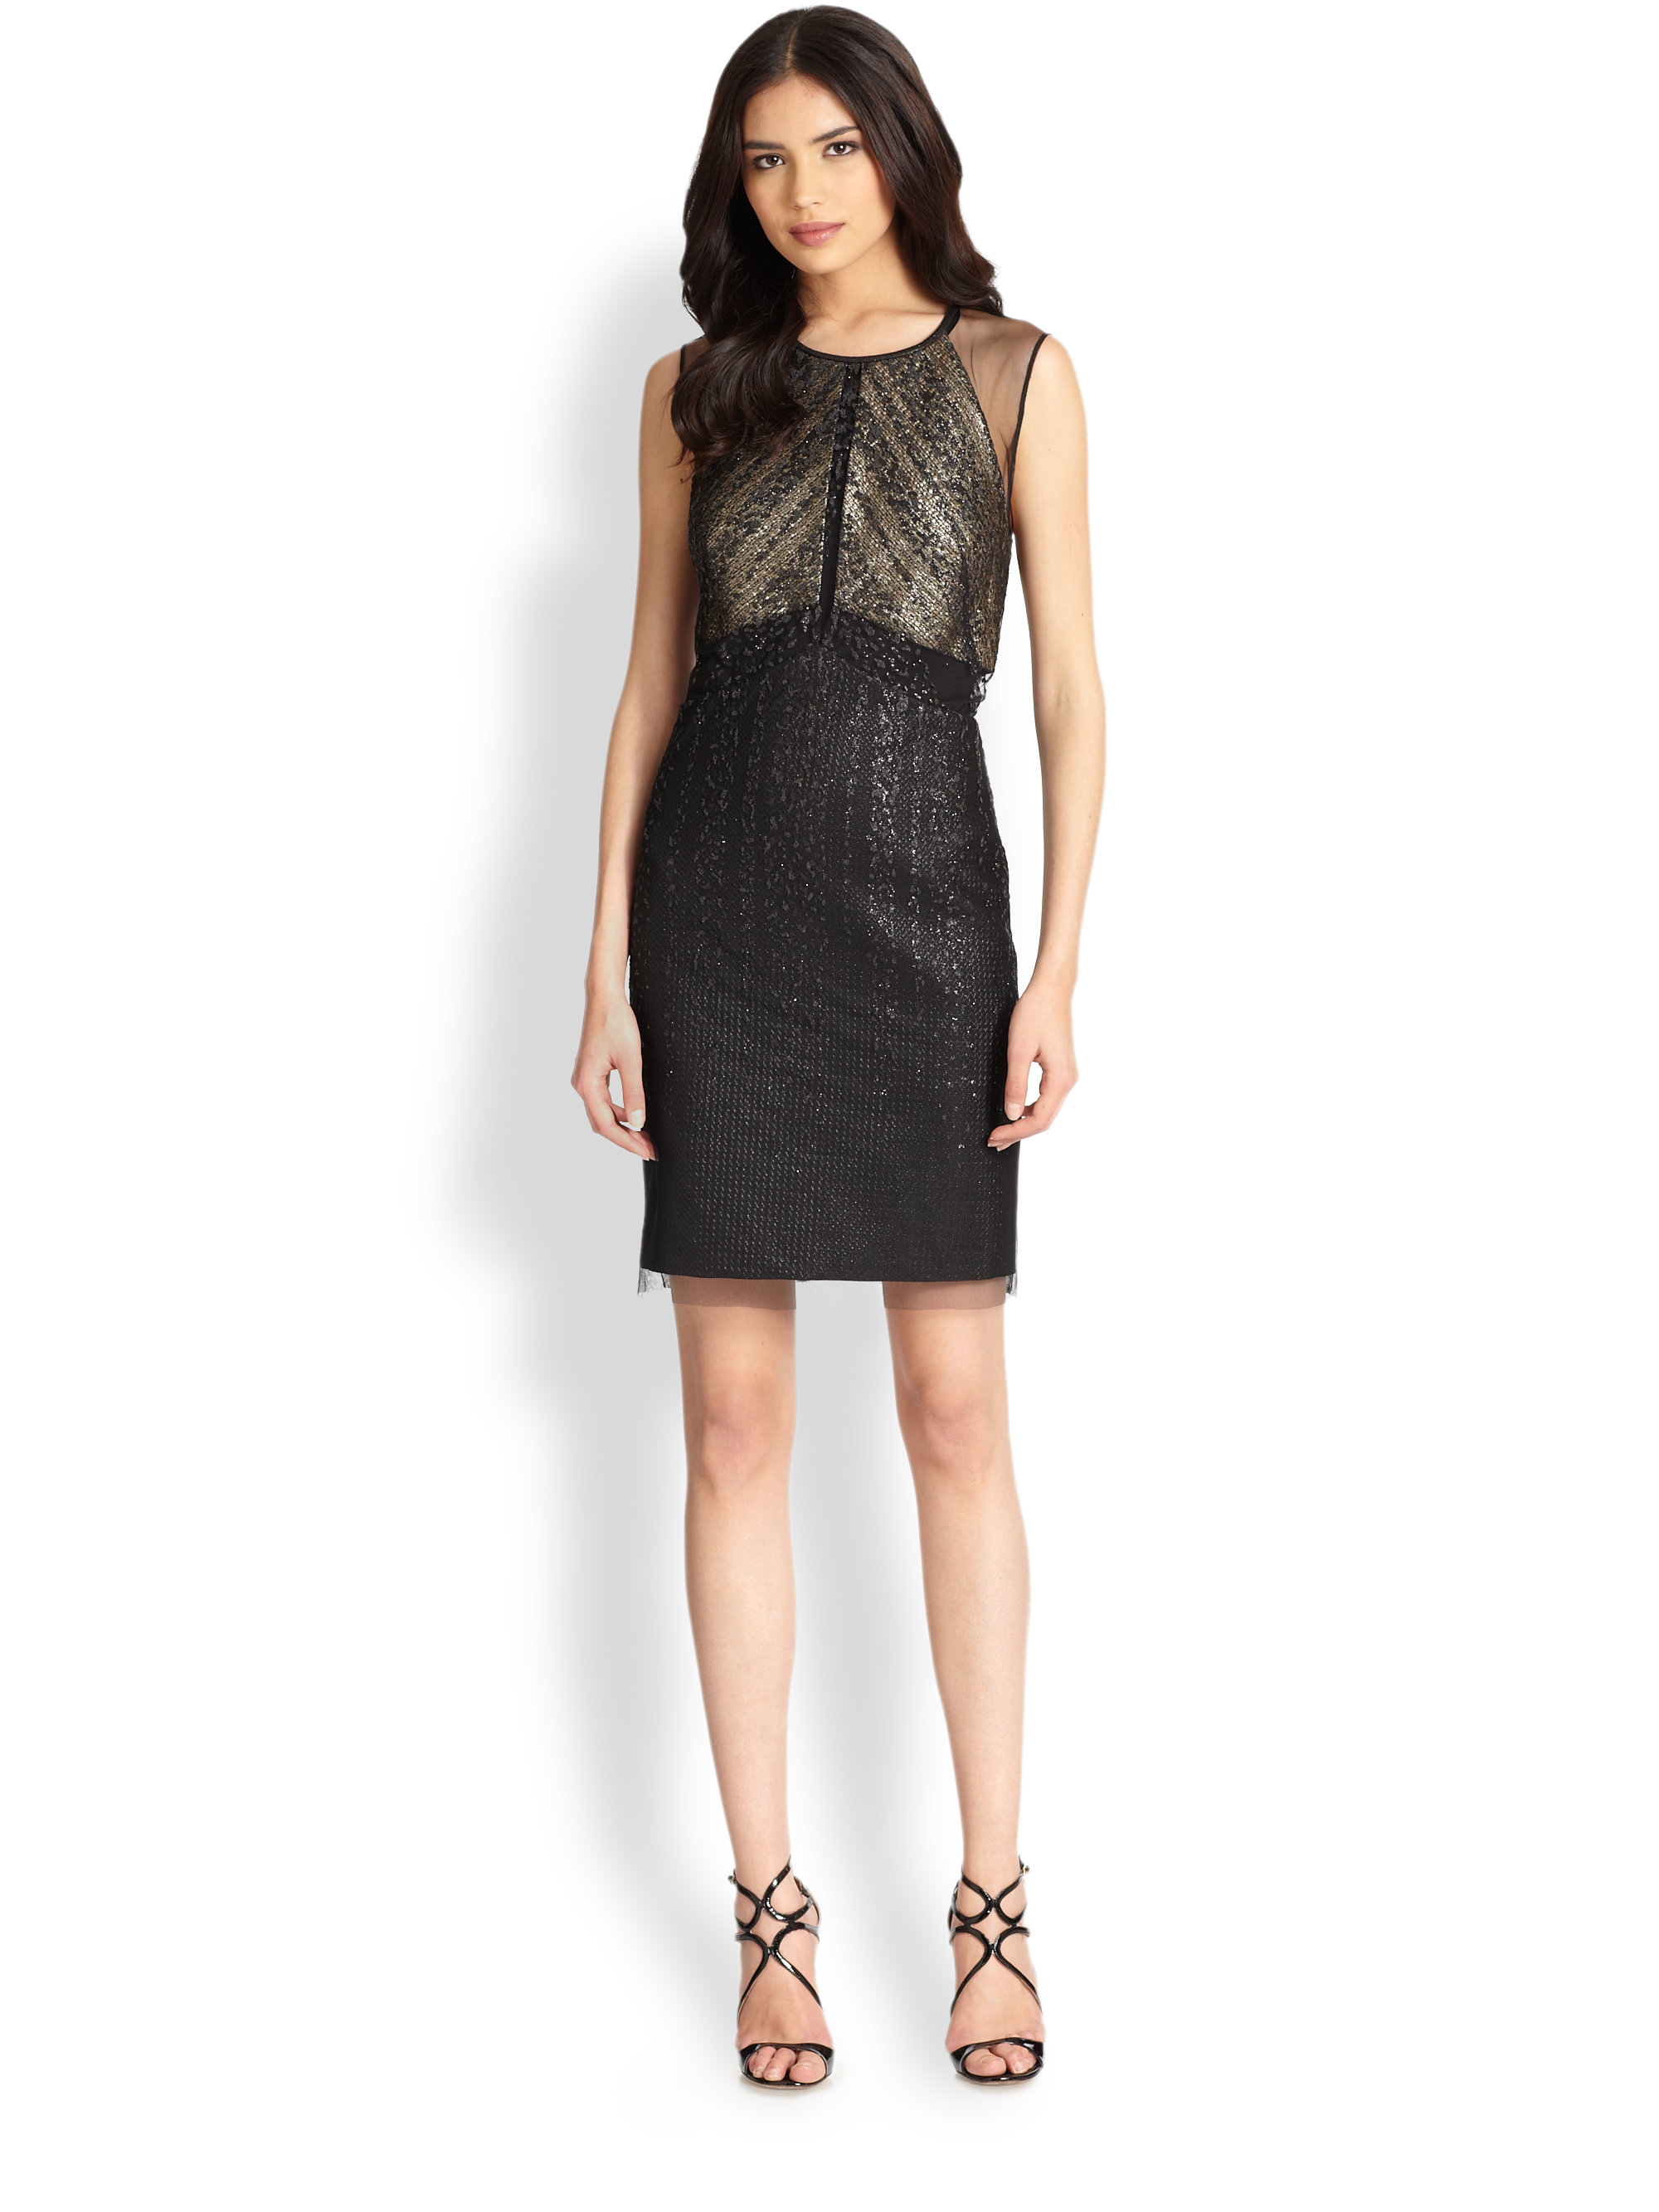 Kay unger Metallic Cocktail Dress in Black  Lyst